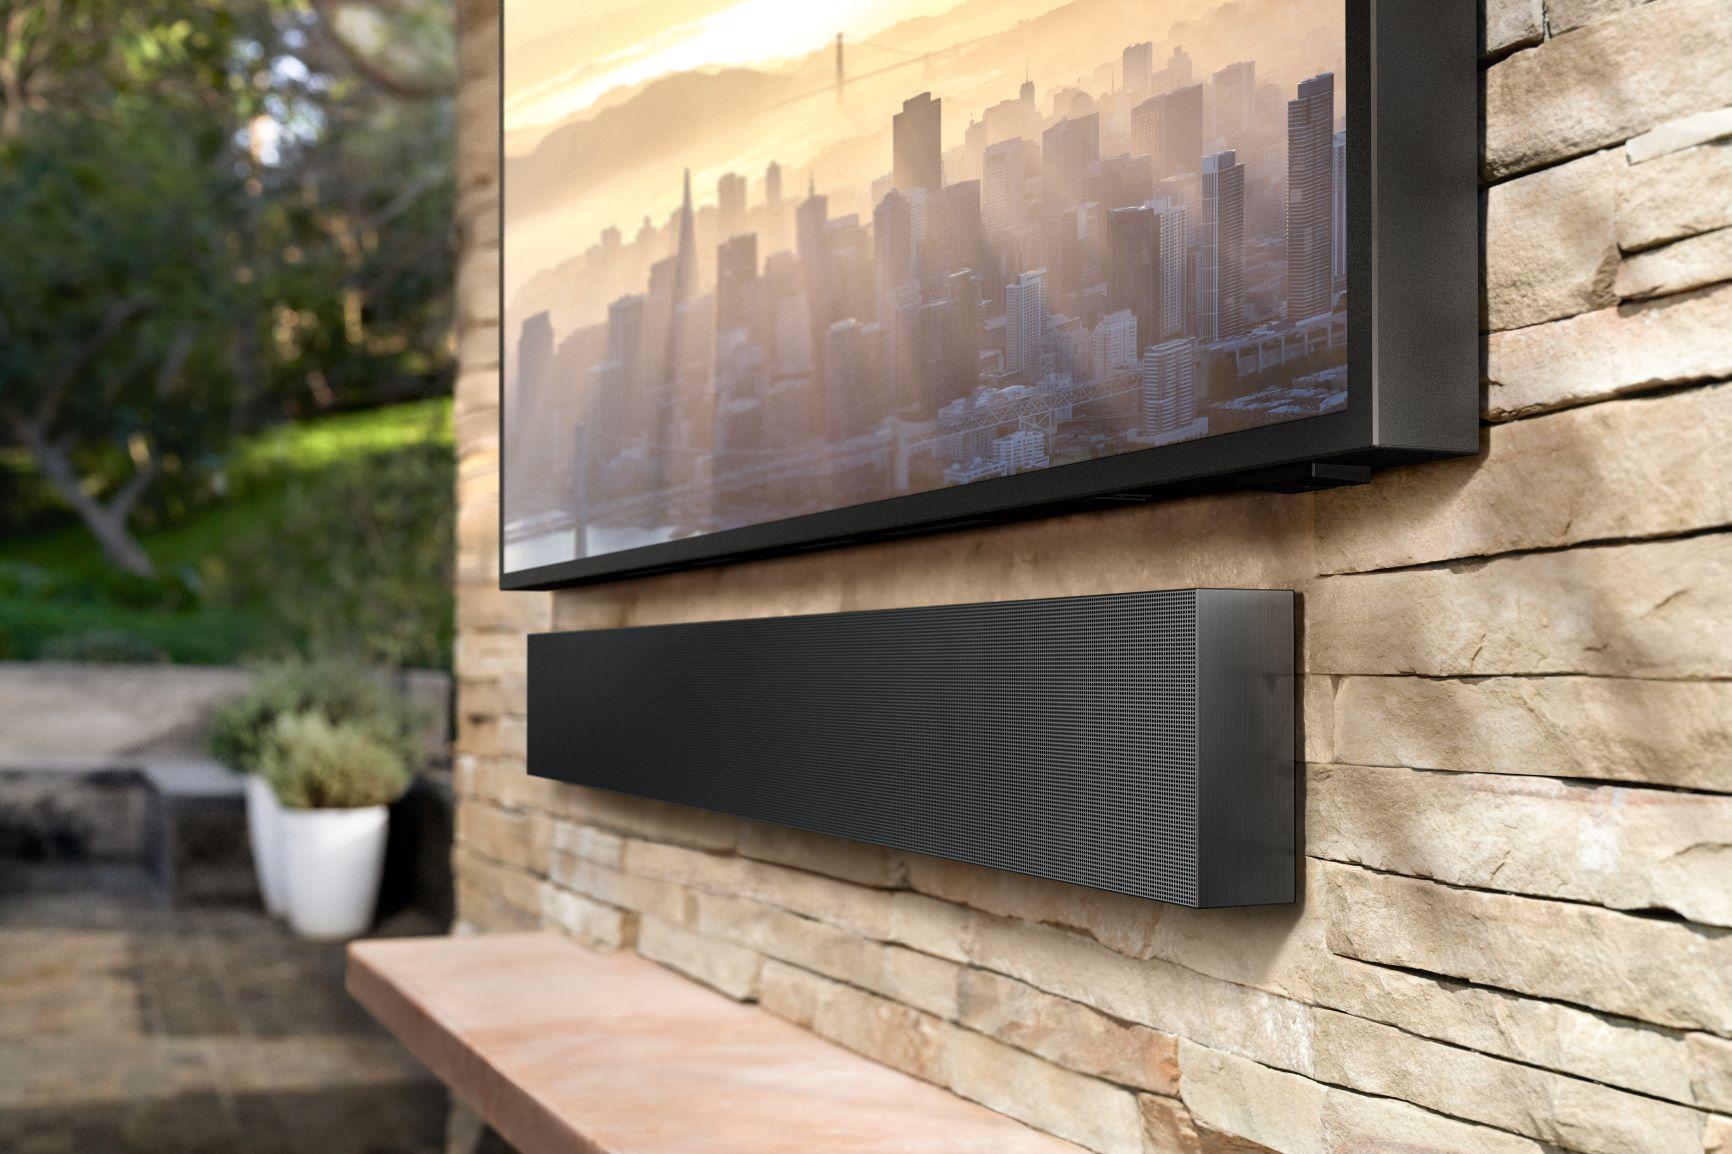 Samsung 4K Outdoor Smart TV Apple TV AirPlay 2